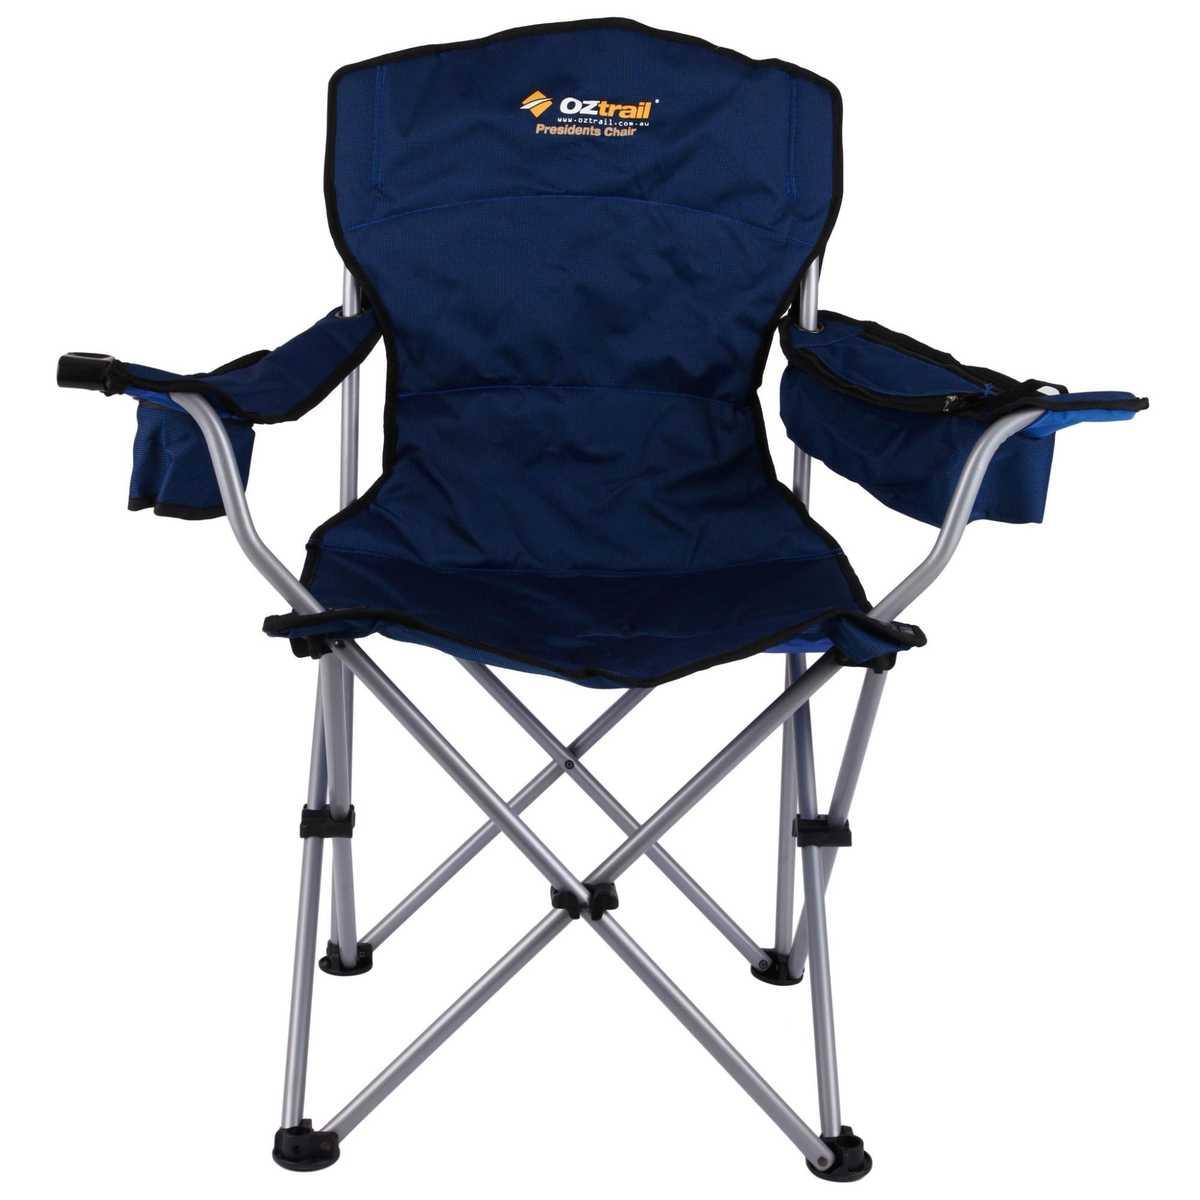 hanging chair big w dxracer gaming canada oztrail 2 tone presidents